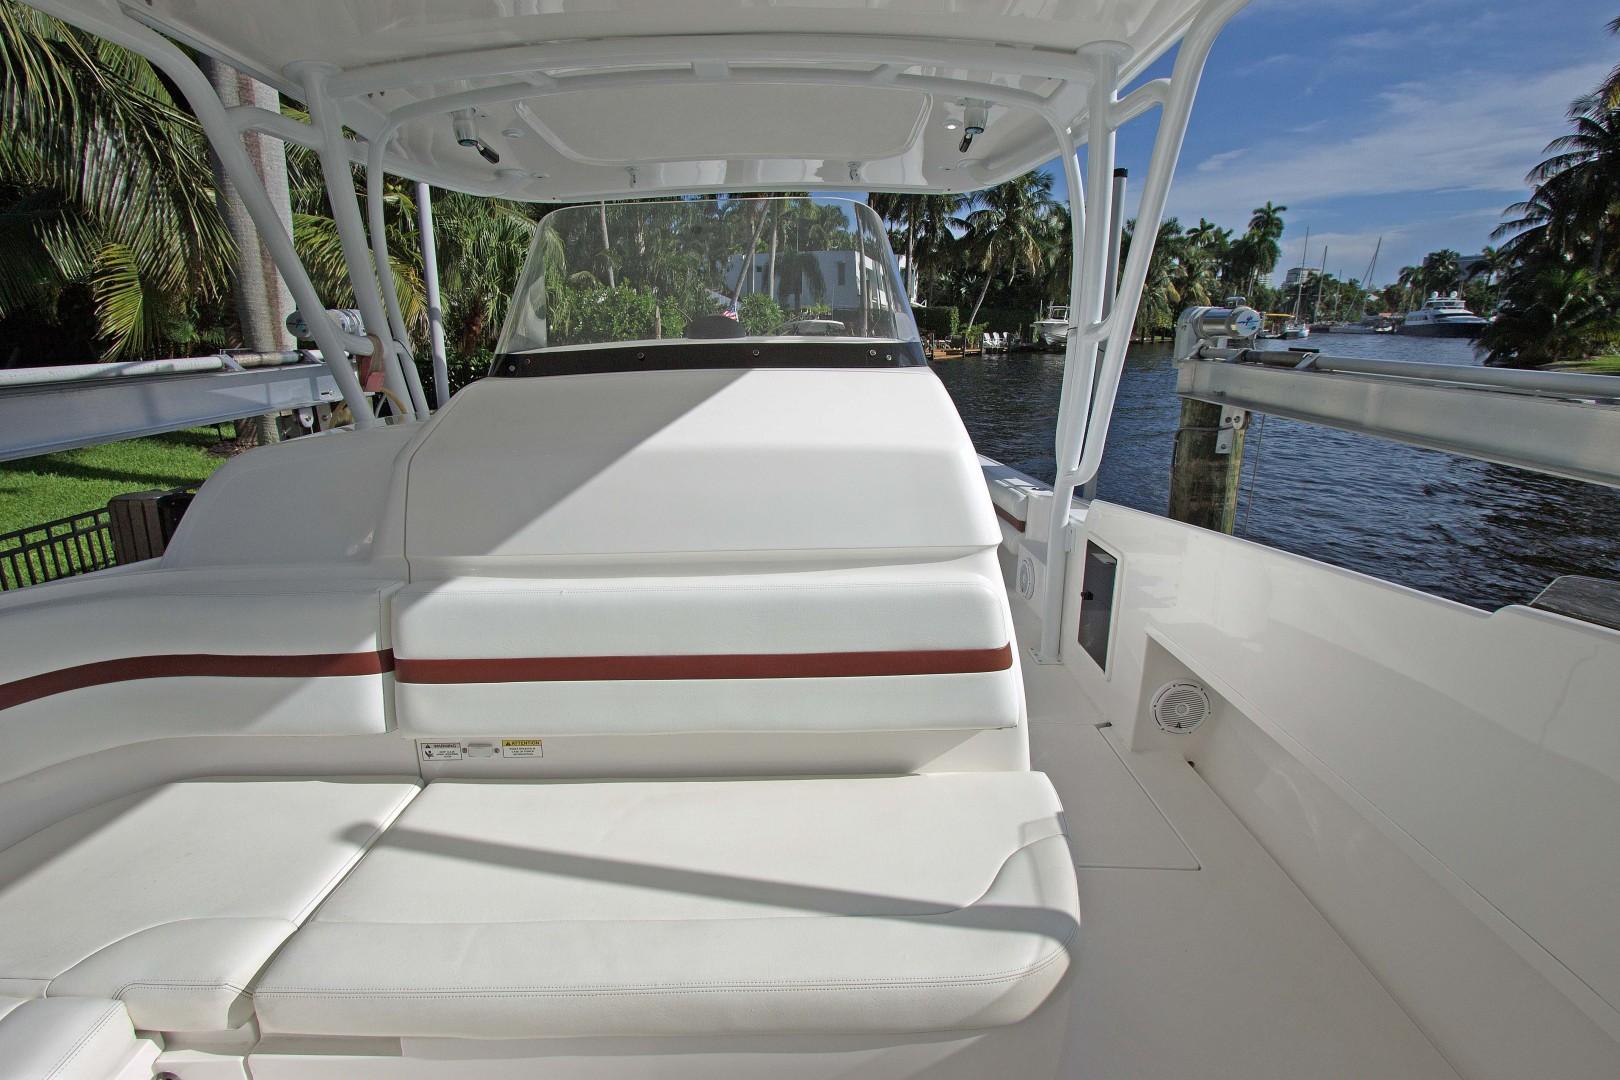 Intrepid-375 Walkaround 2014-NN 375 Walkaround 2014 Fort Lauderdale-Florida-United States-1507860 | Thumbnail